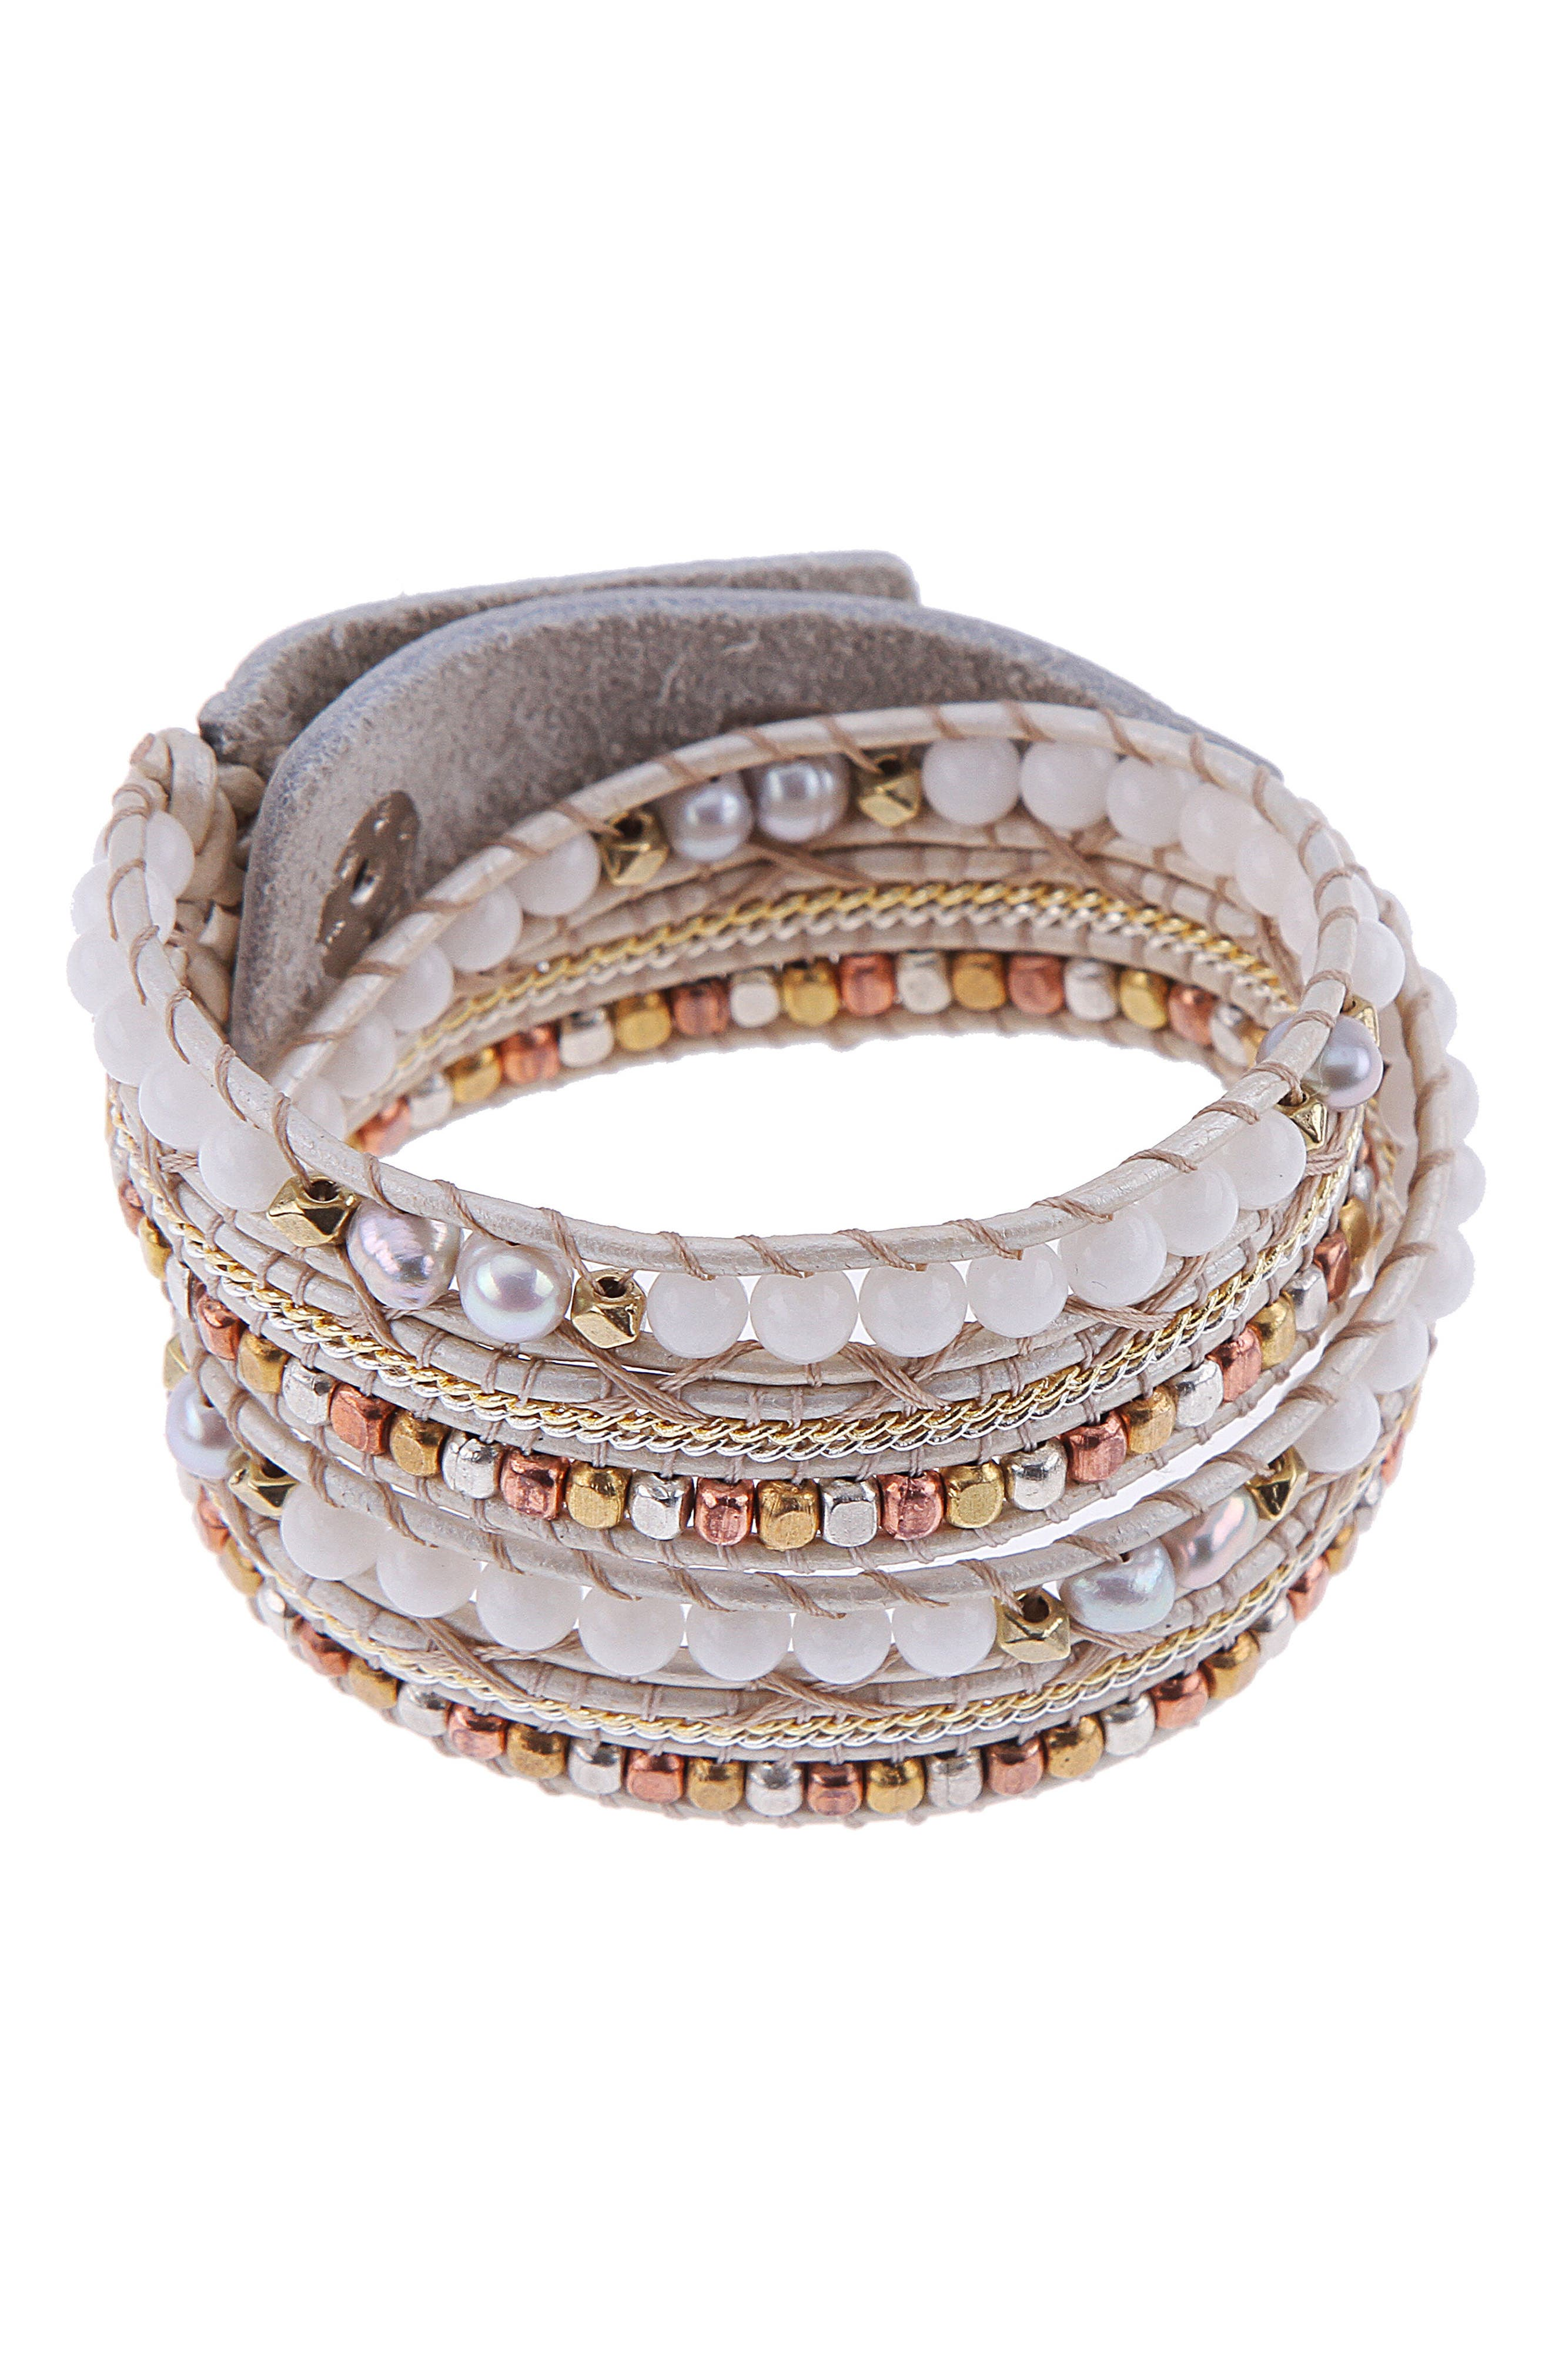 Stone & Metal Wrap Bracelet,                             Main thumbnail 1, color,                             800